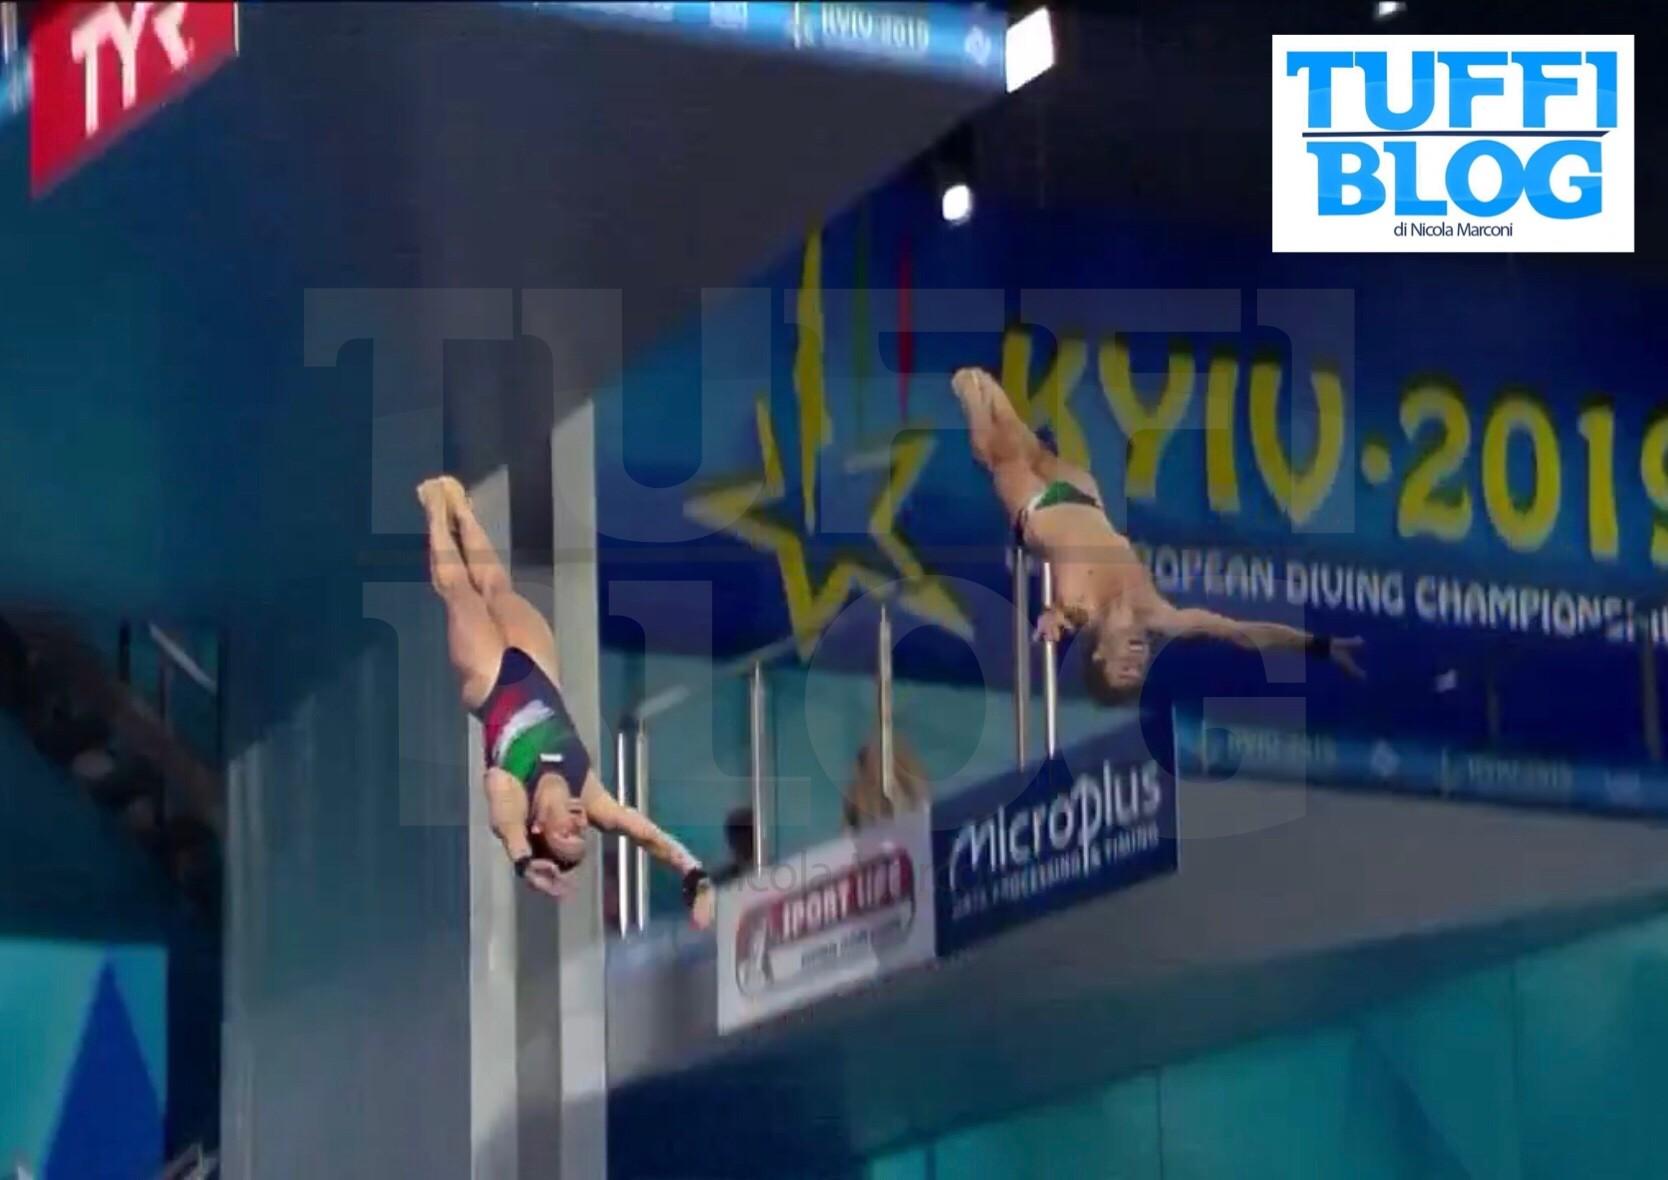 Campionati Europei: Kyiv - sincro misto Batki e Verzotto, un amaro quarto posto